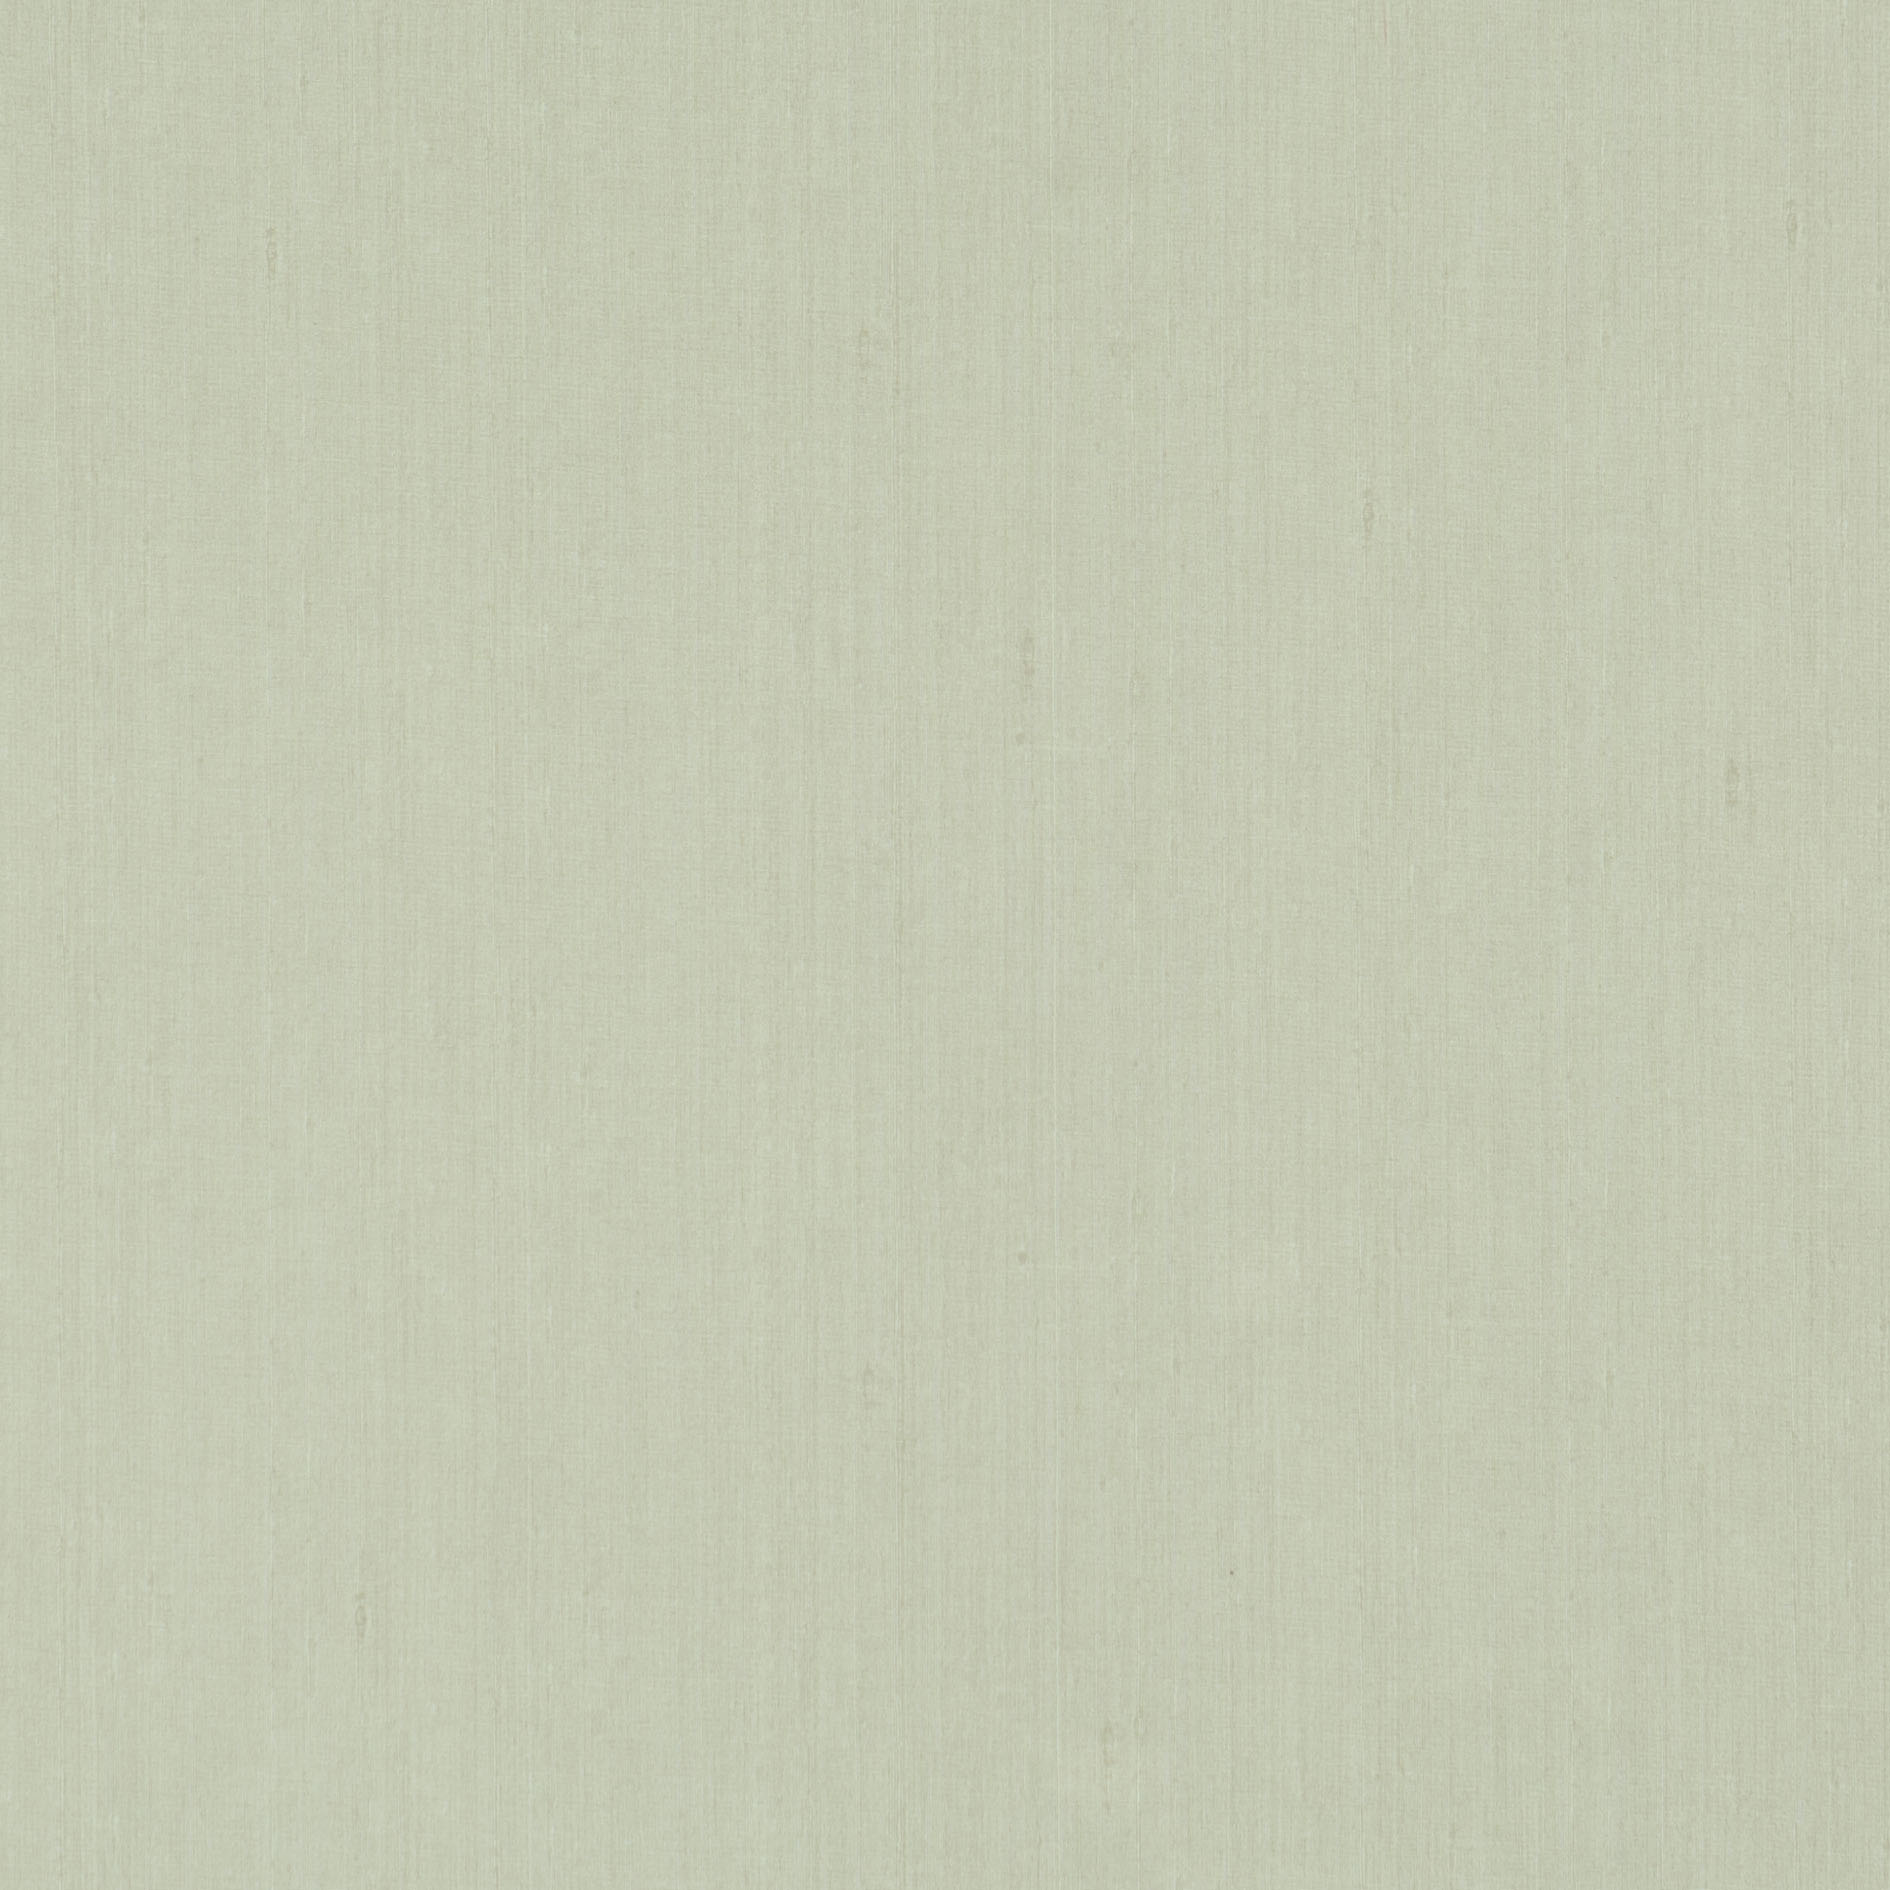 Обои  BN International,  коллекция Colour Line, артикул46792